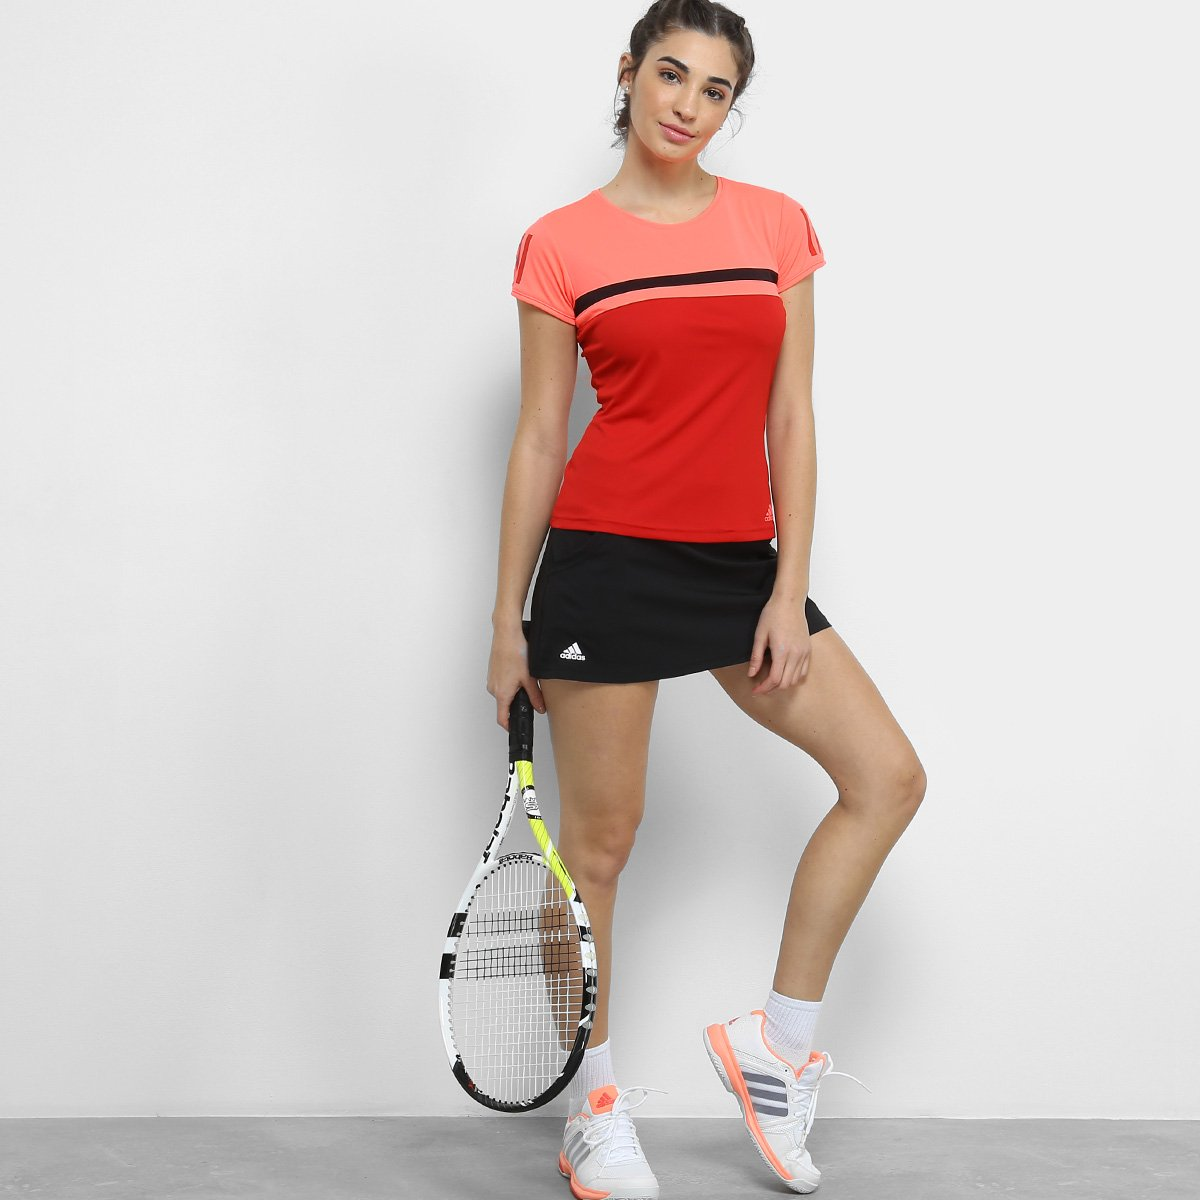 Camiseta Camiseta Adidas Adidas Vermelho Club Feminina 50rdCrwxq